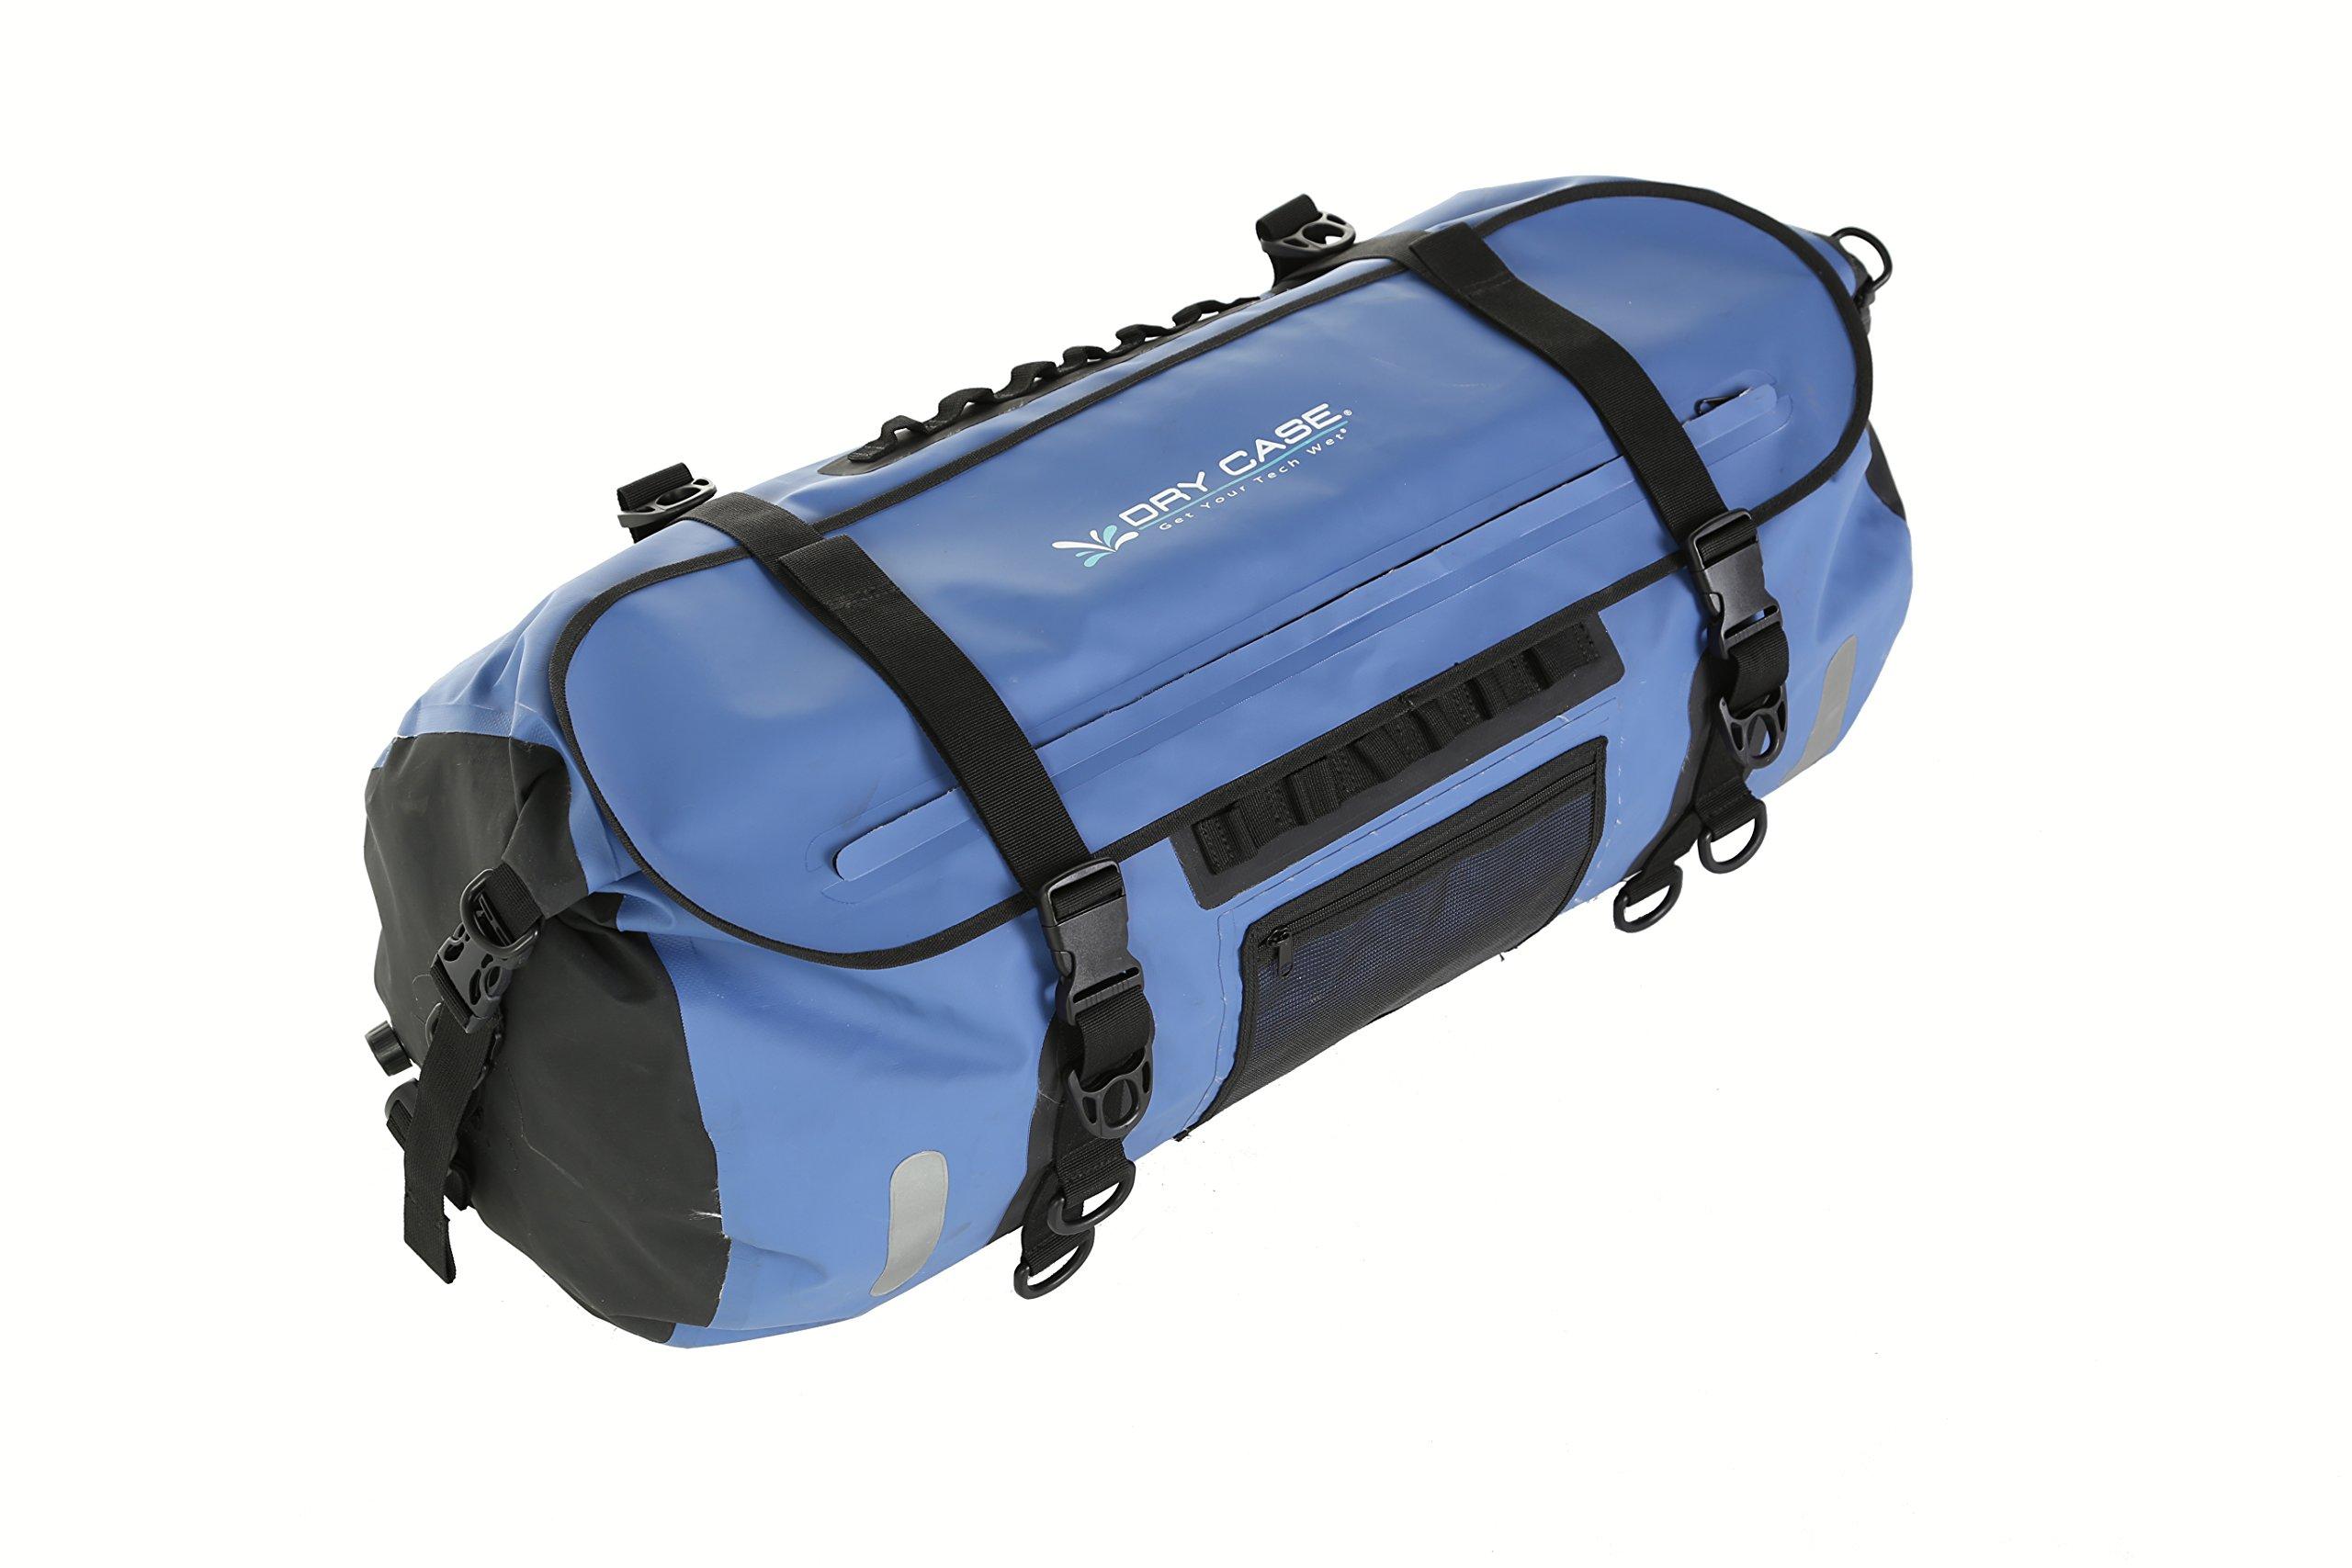 DRYCASE Liberty Ship-Waterproof Duffel/Backpack-80 Liter